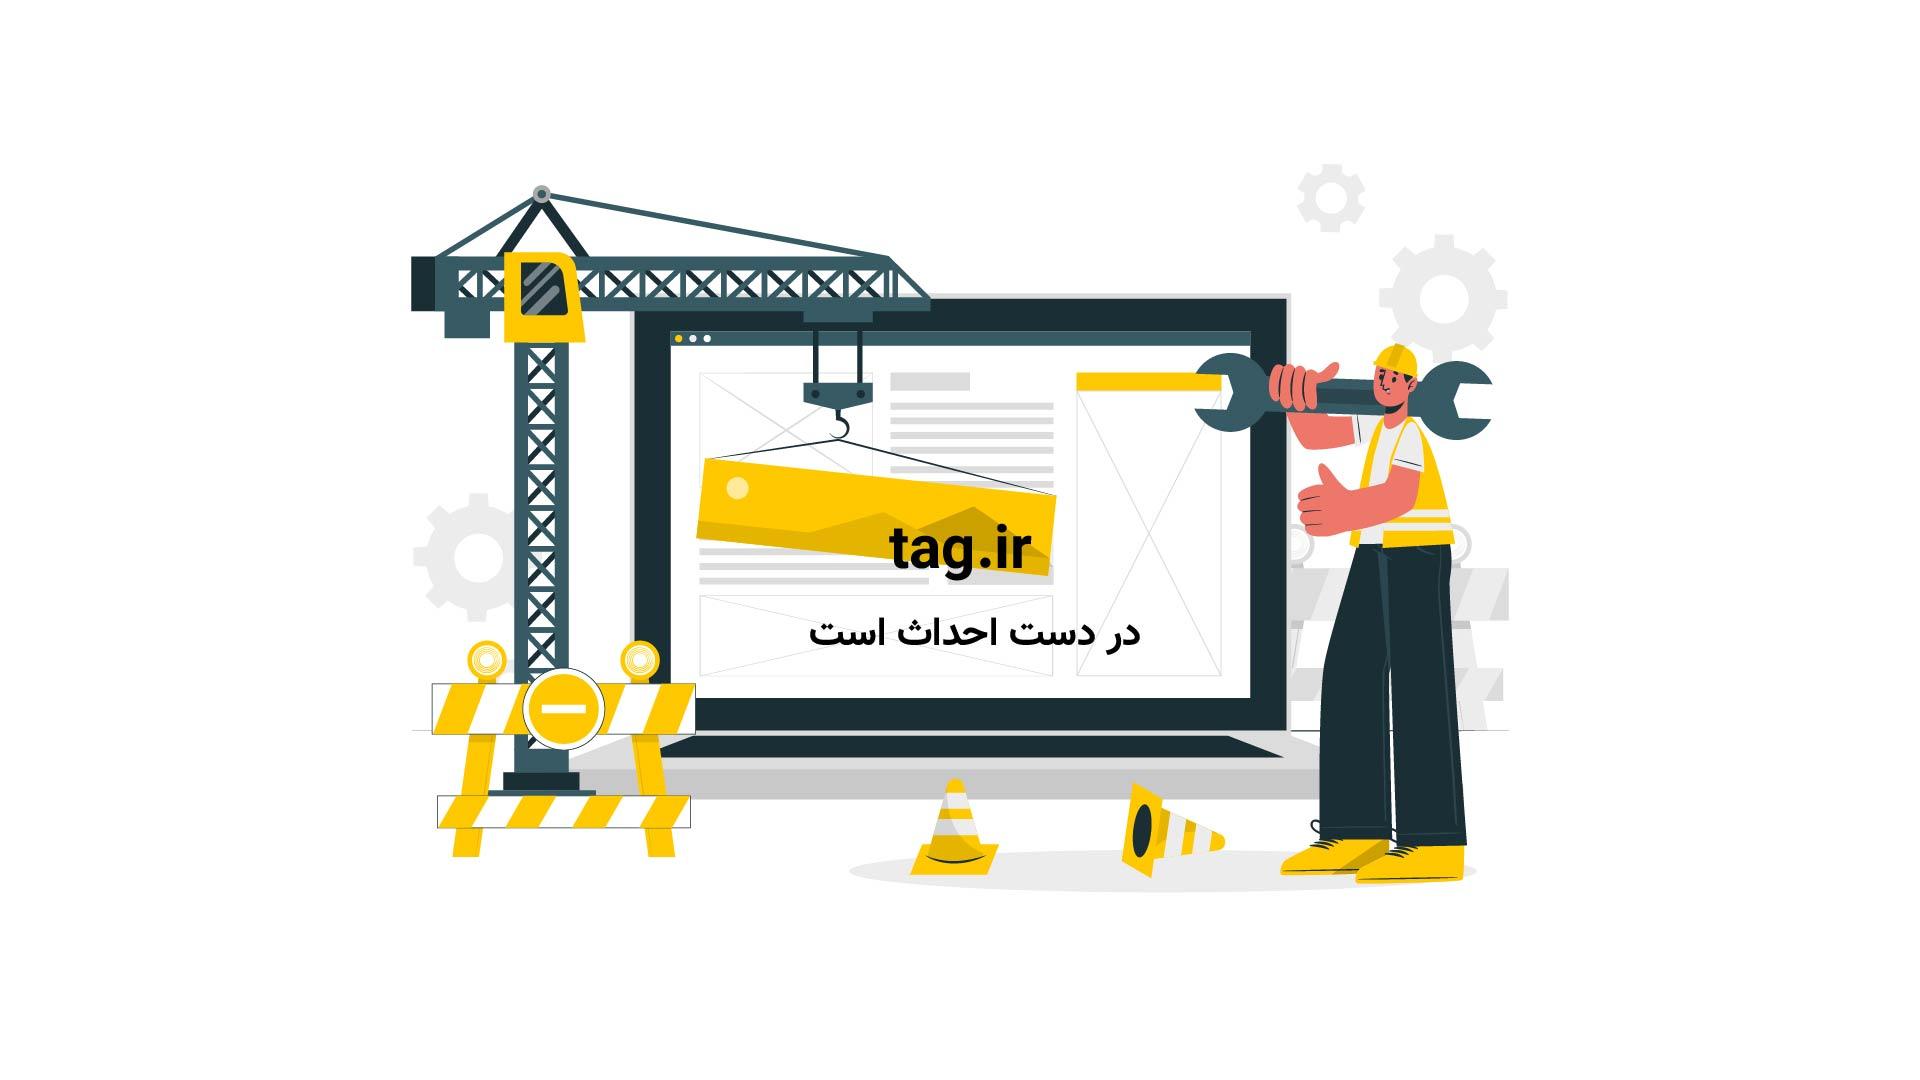 حمله وحشیانه یک تماشاچی فوتبال | تگ